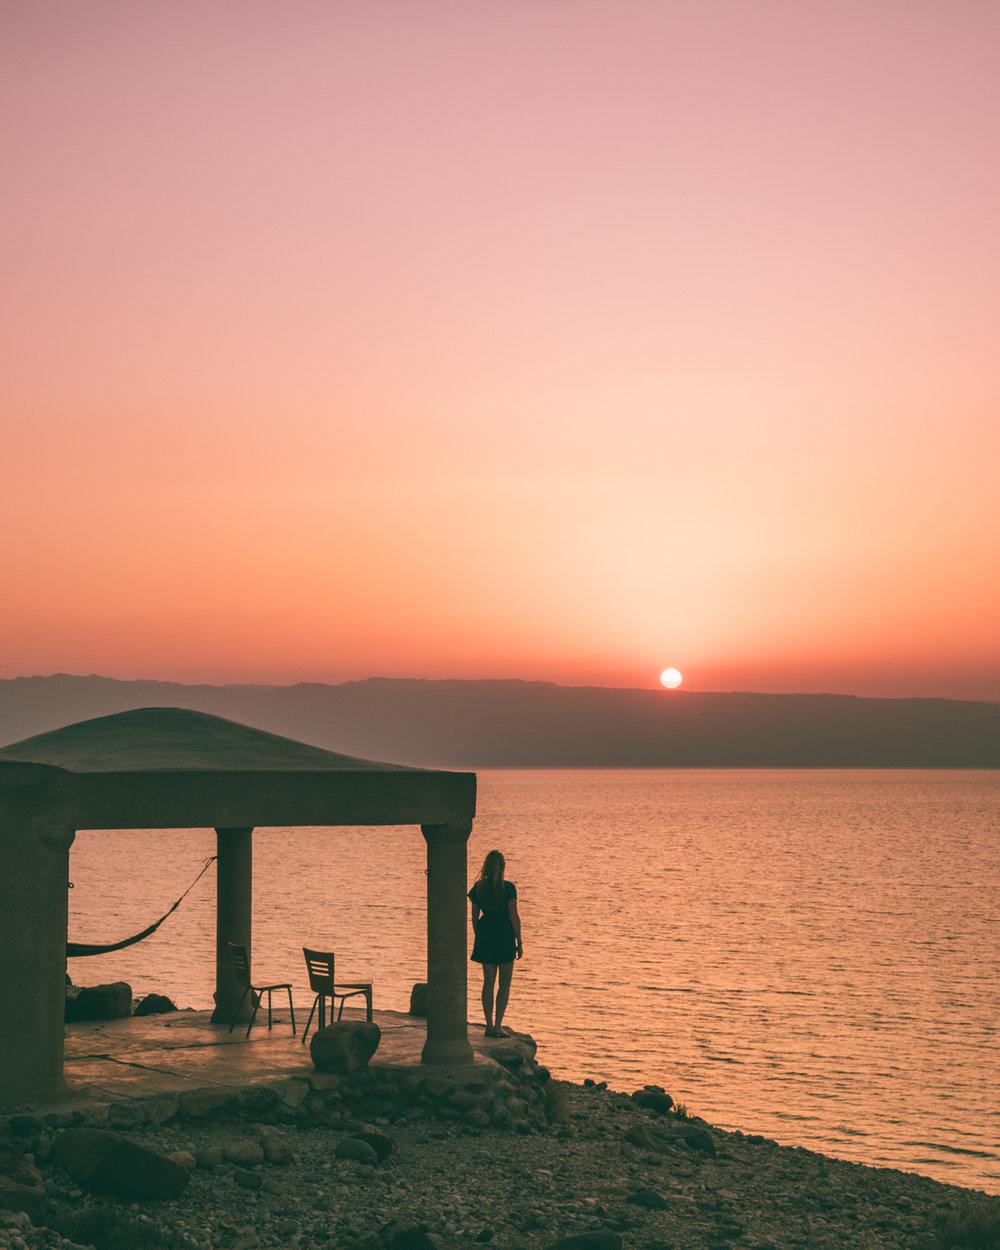 Backpacking Jordan - Wadi Mujib